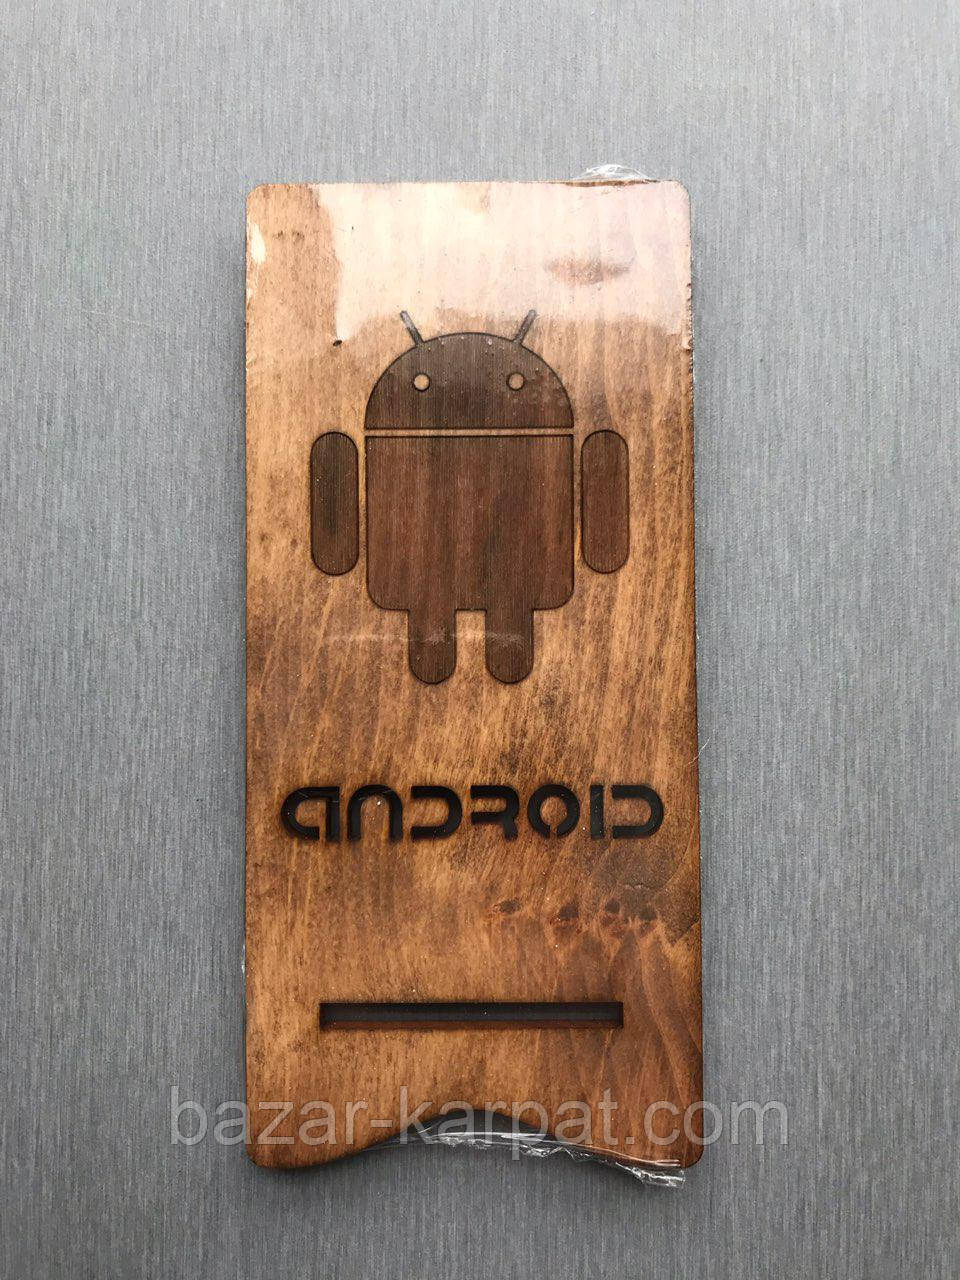 Подставка под Android - фото 1